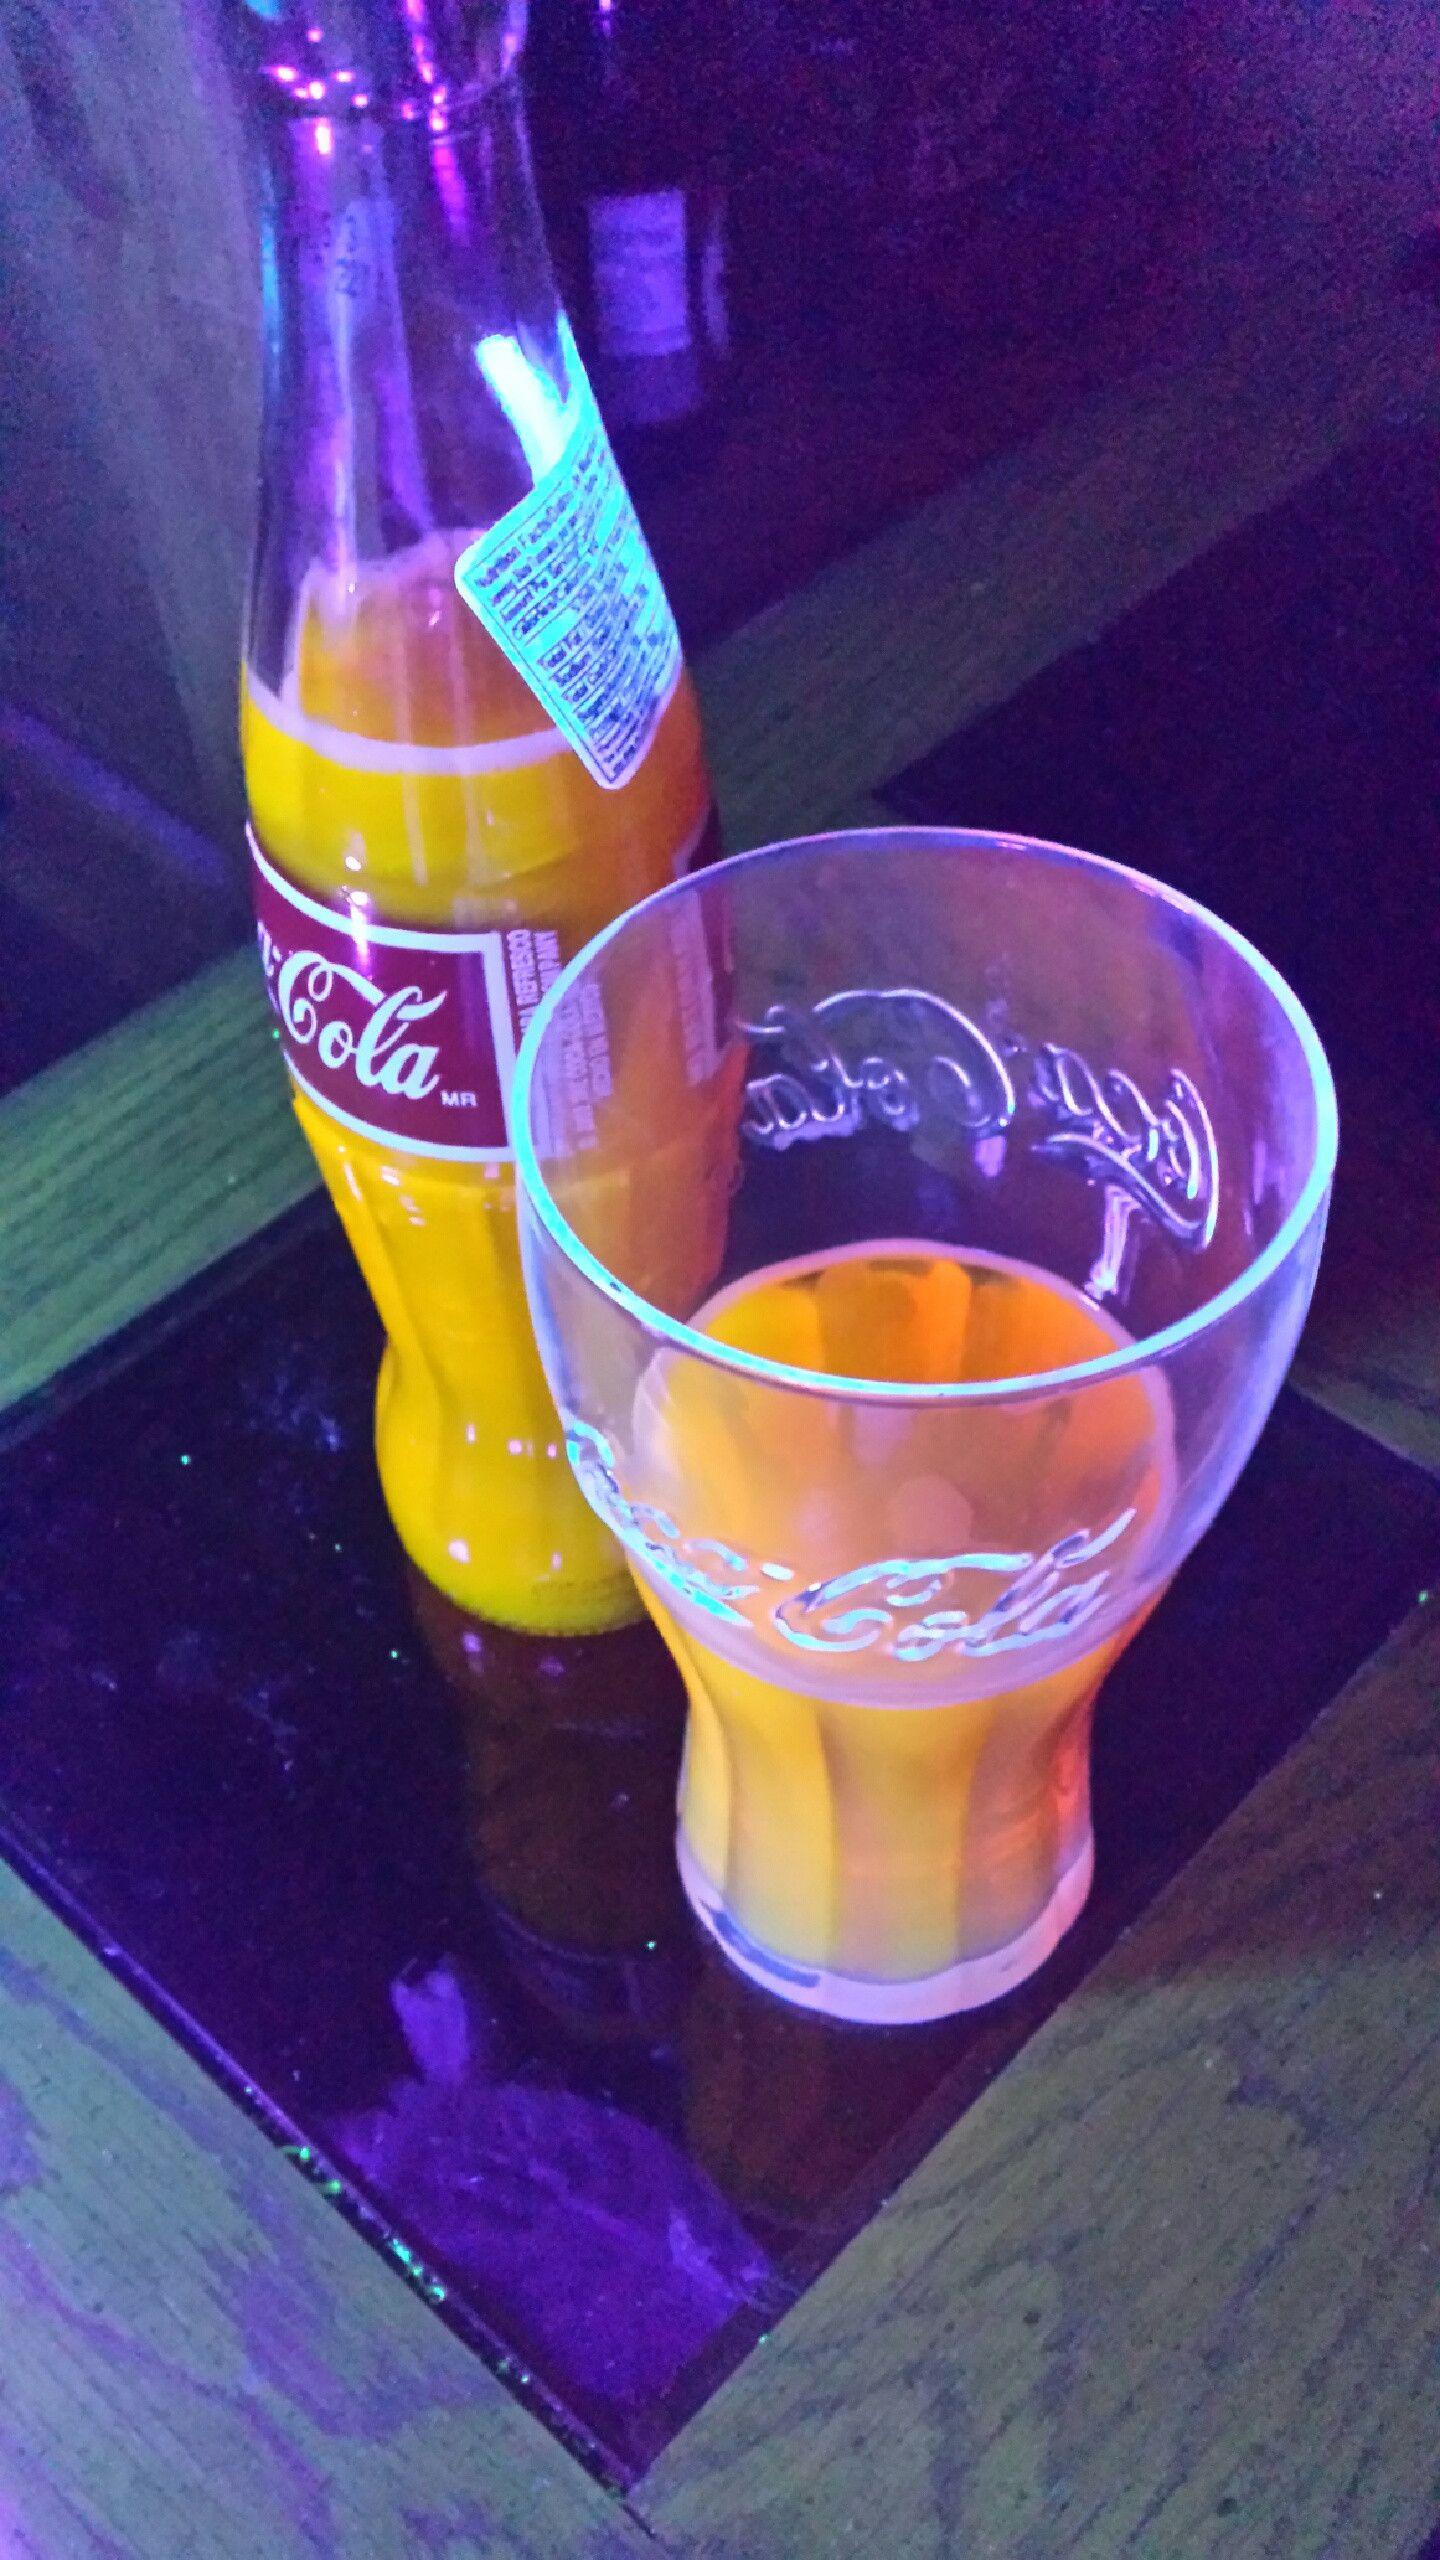 nuka cola victory alcoholic beverage in 2018 food drink